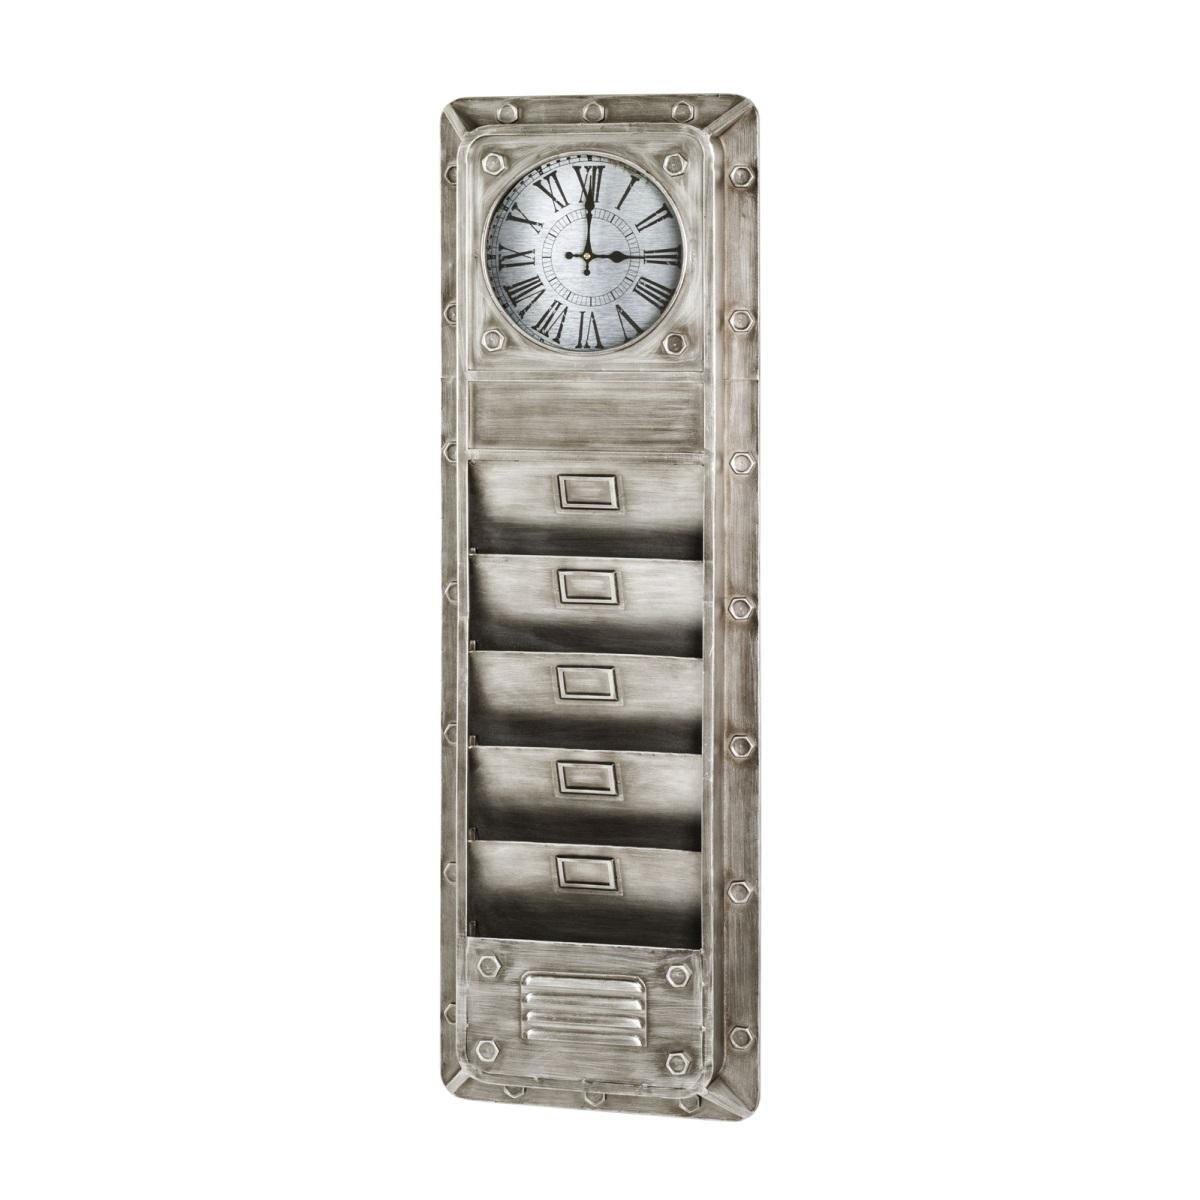 [porta] Memoboard mit integrierter Uhr | Metall silber & Holznachbildung grau